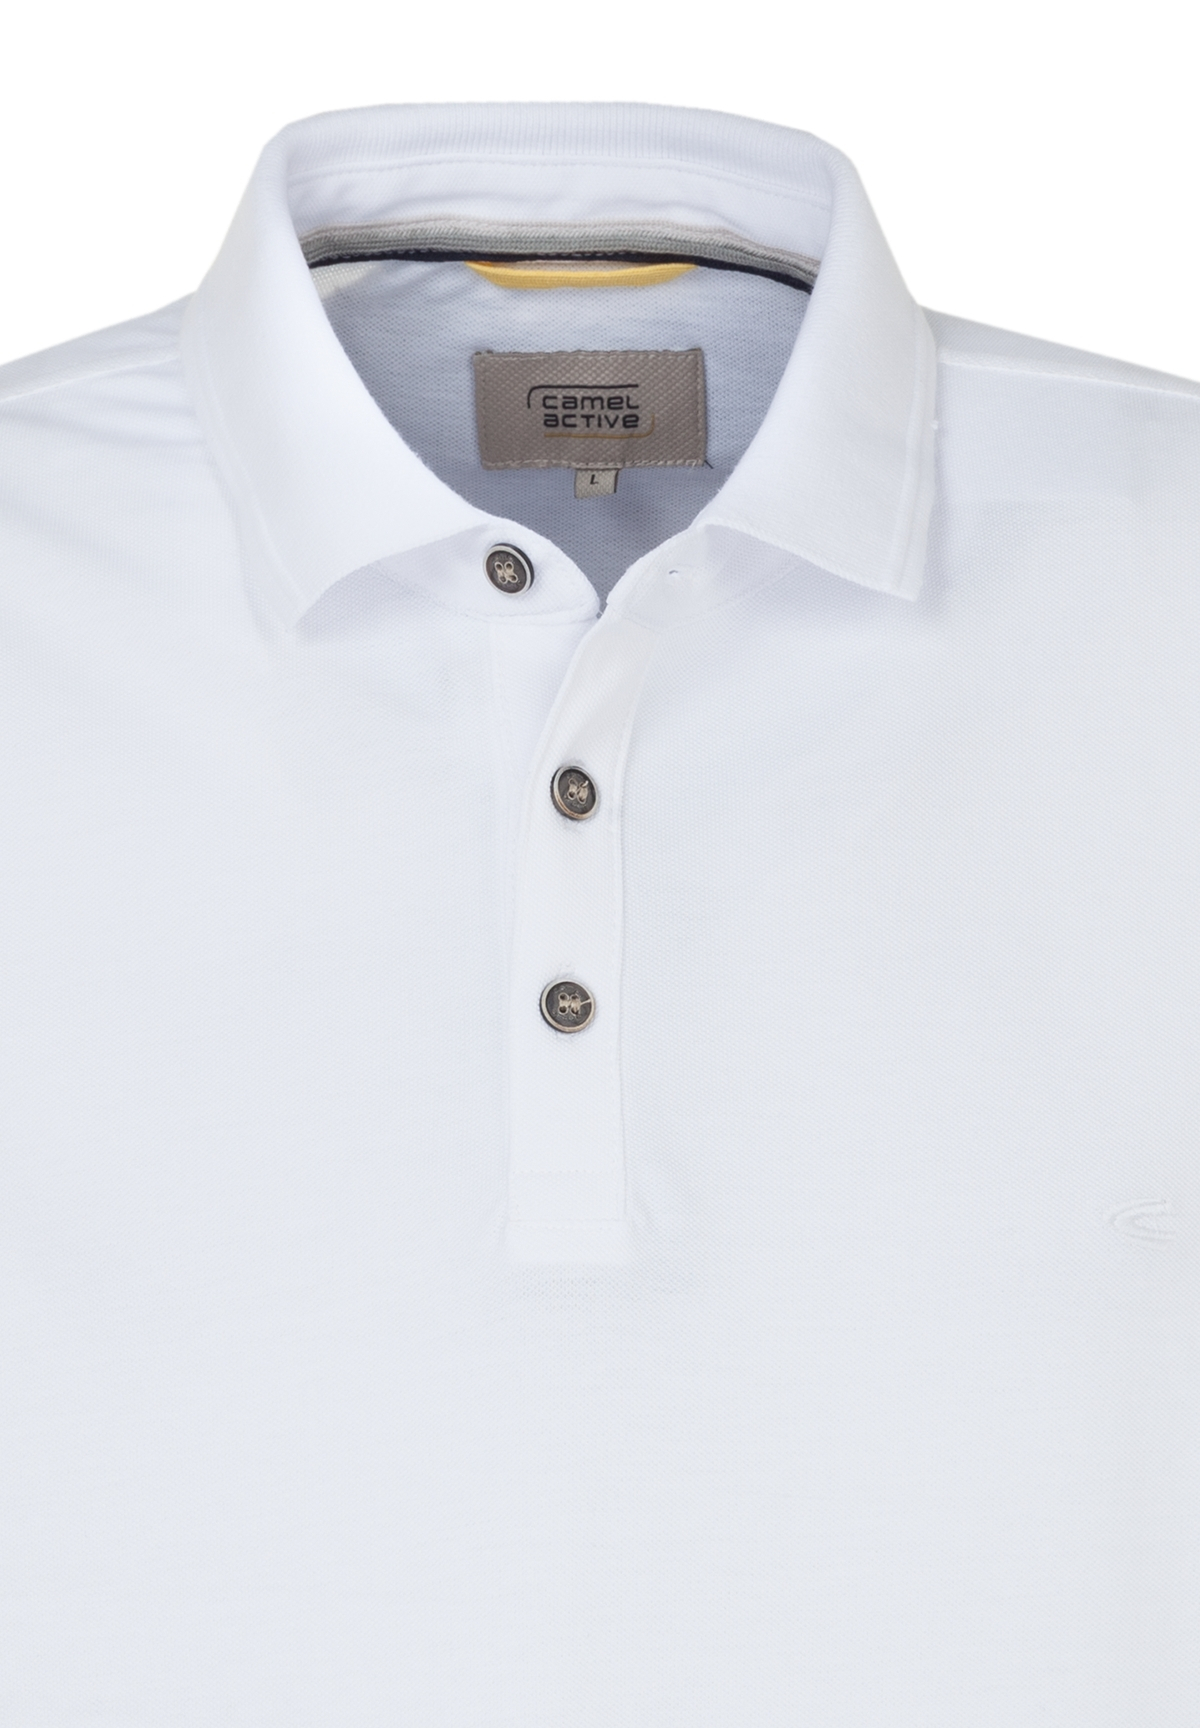 Camel-Active-Herren-Shirt-Poloshirt-Pique-Regular-Fit-NEU Indexbild 5